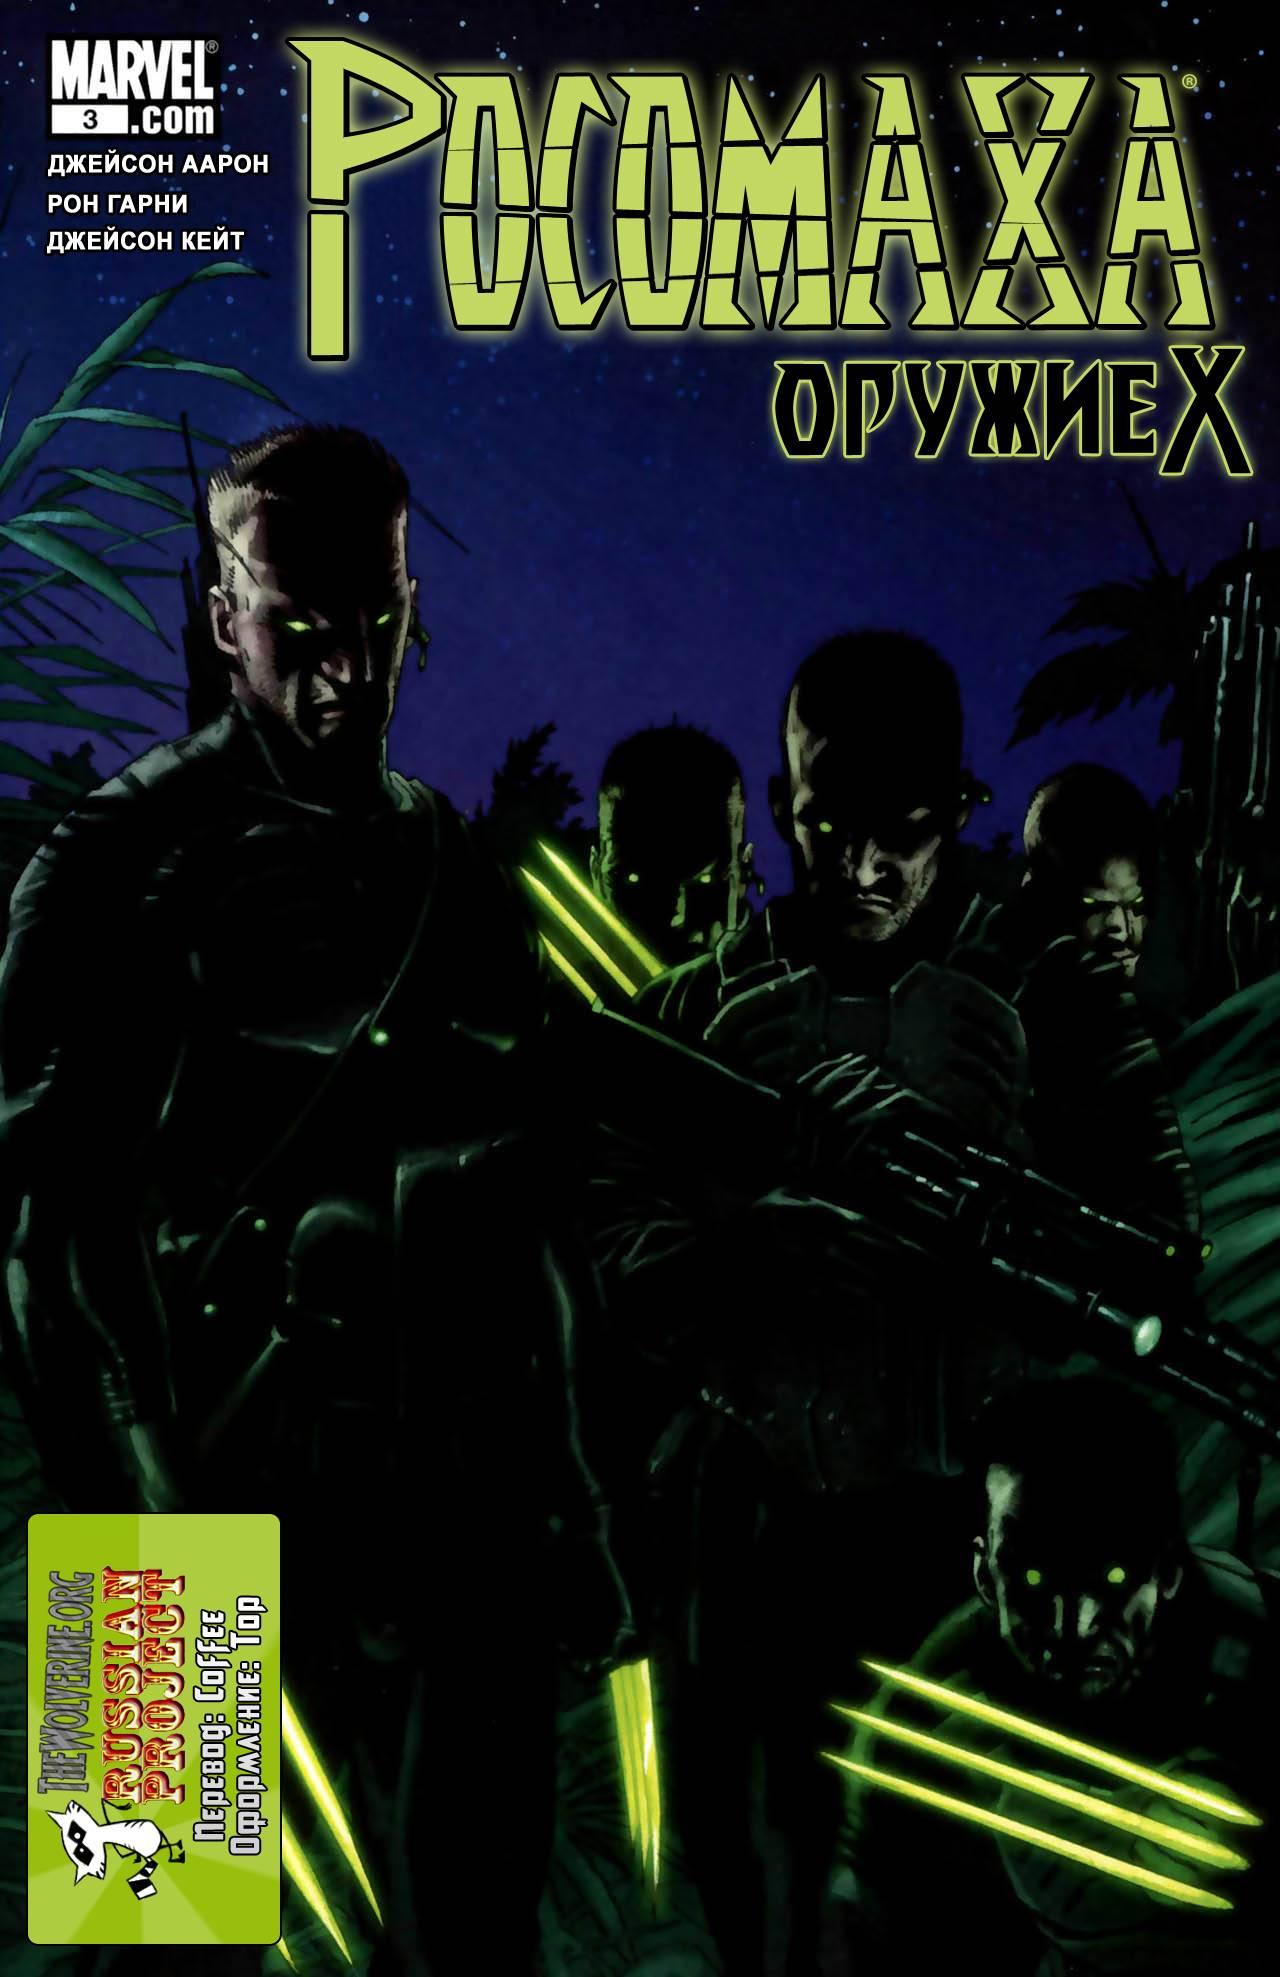 Росомаха: Оружие Икс №3 онлайн